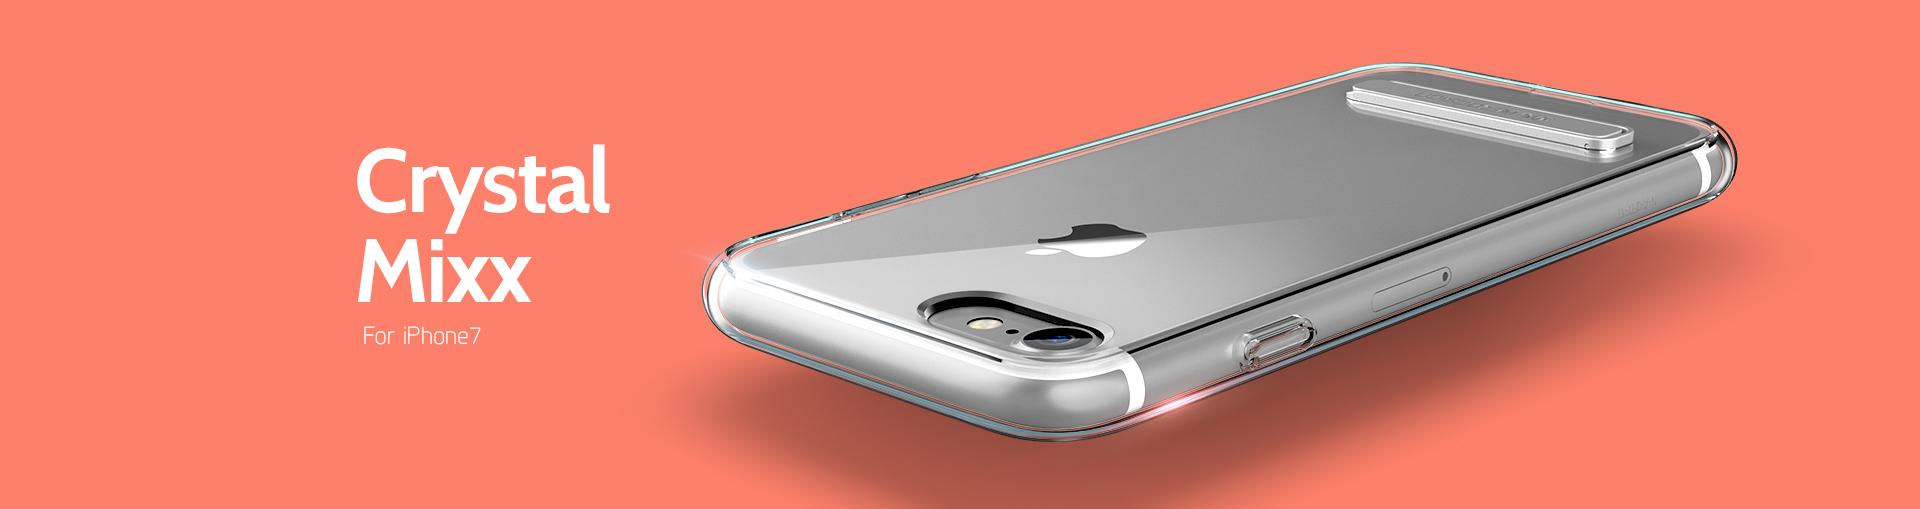 iPhone 7 Crystal Mixx